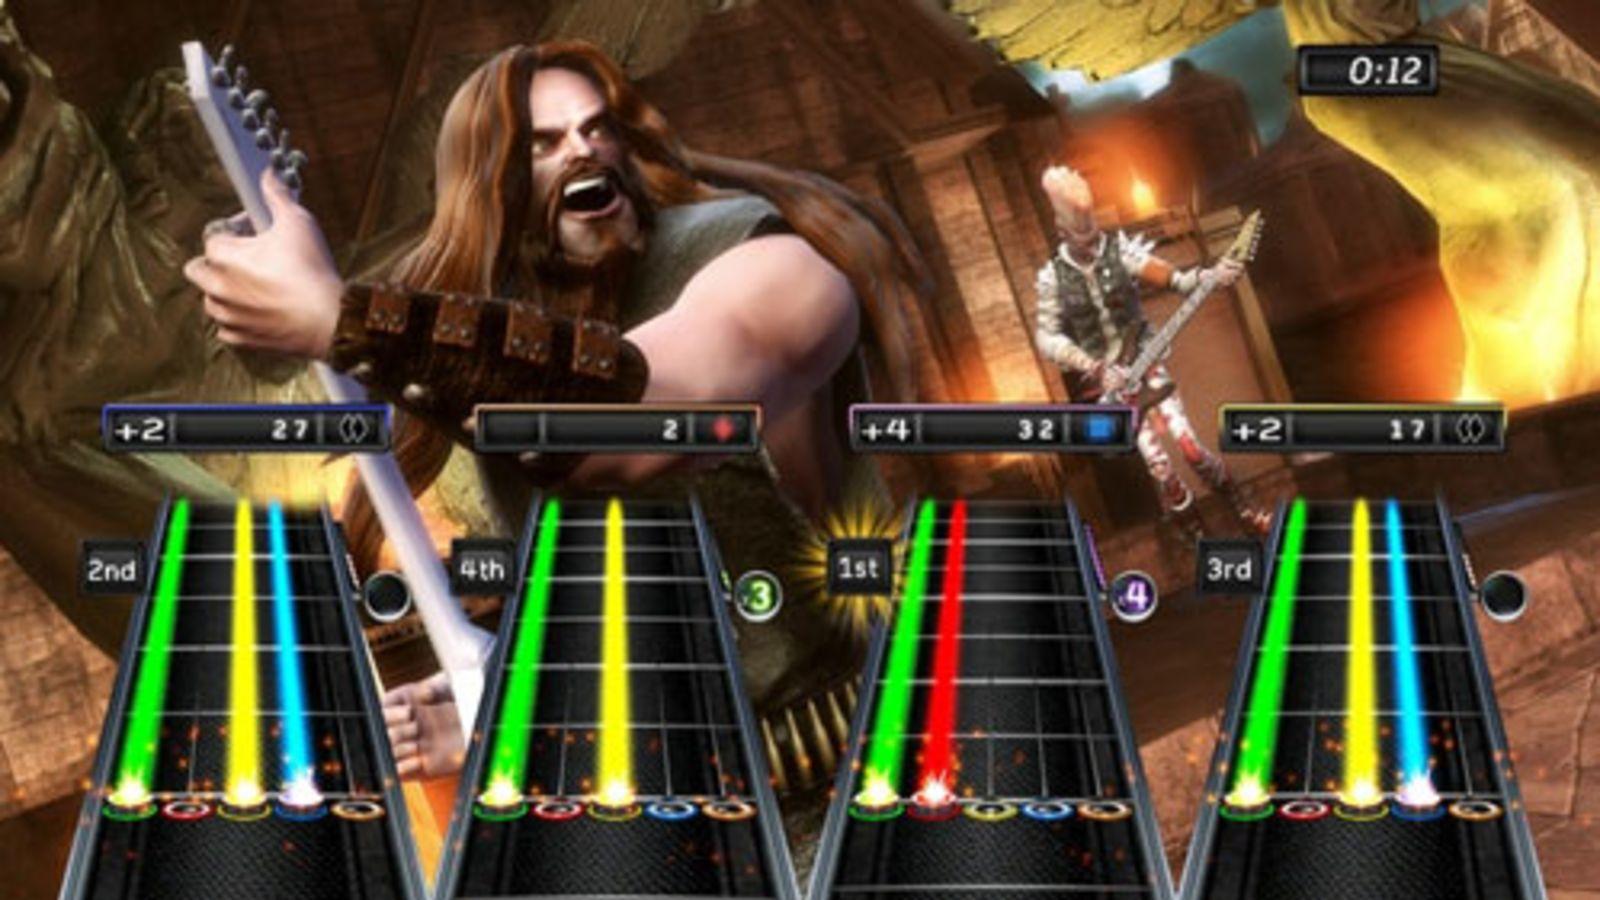 Guitar Hero 5 PlayStation 2 Cheats Guide